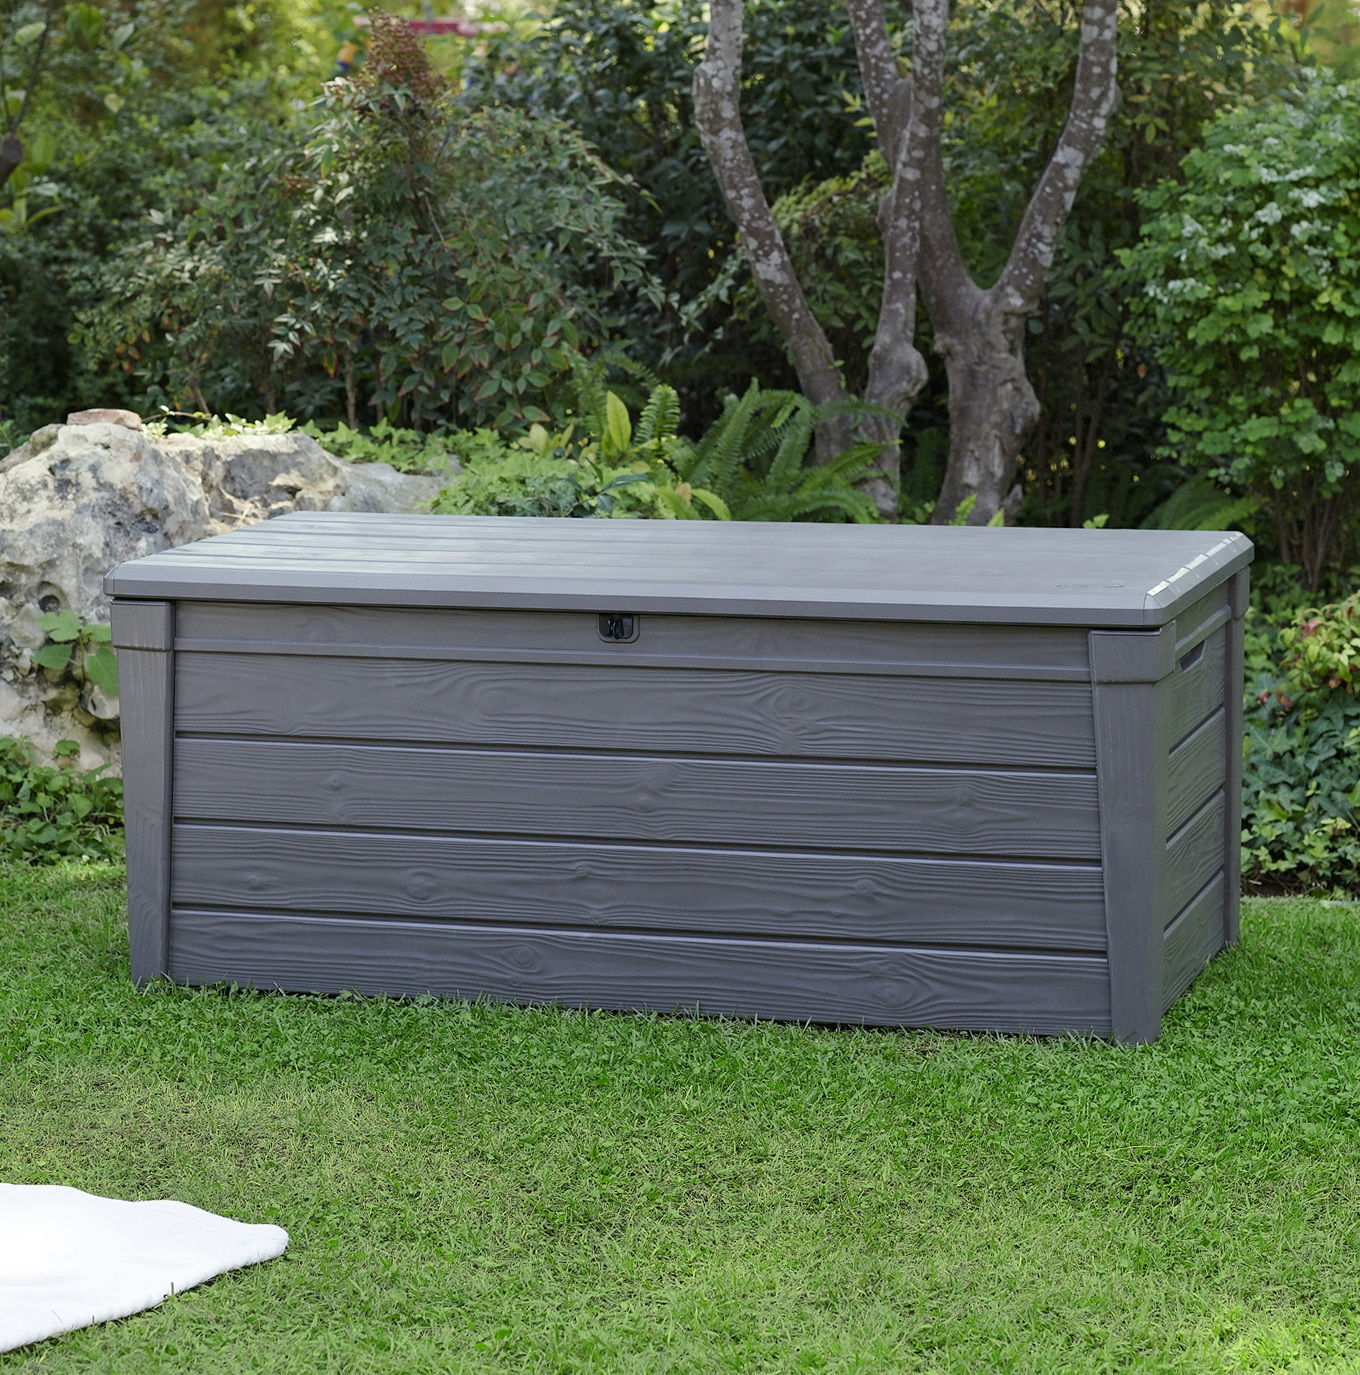 Keter Brightwood Deck Box 120 Gallon